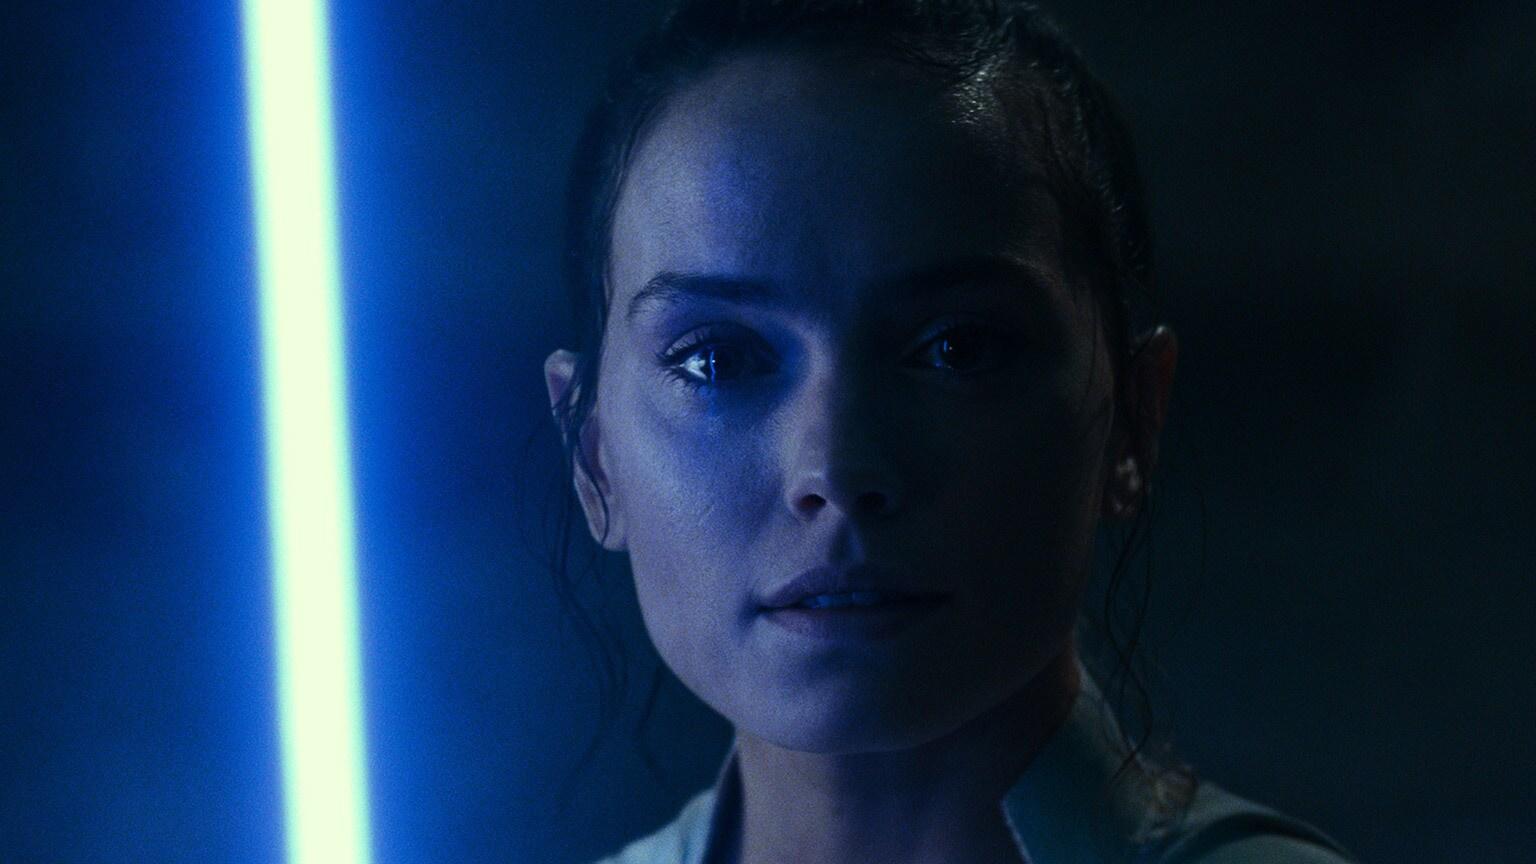 The End of the Skywalker Saga, Star Wars: The Rise of Skywalker, Comes Home